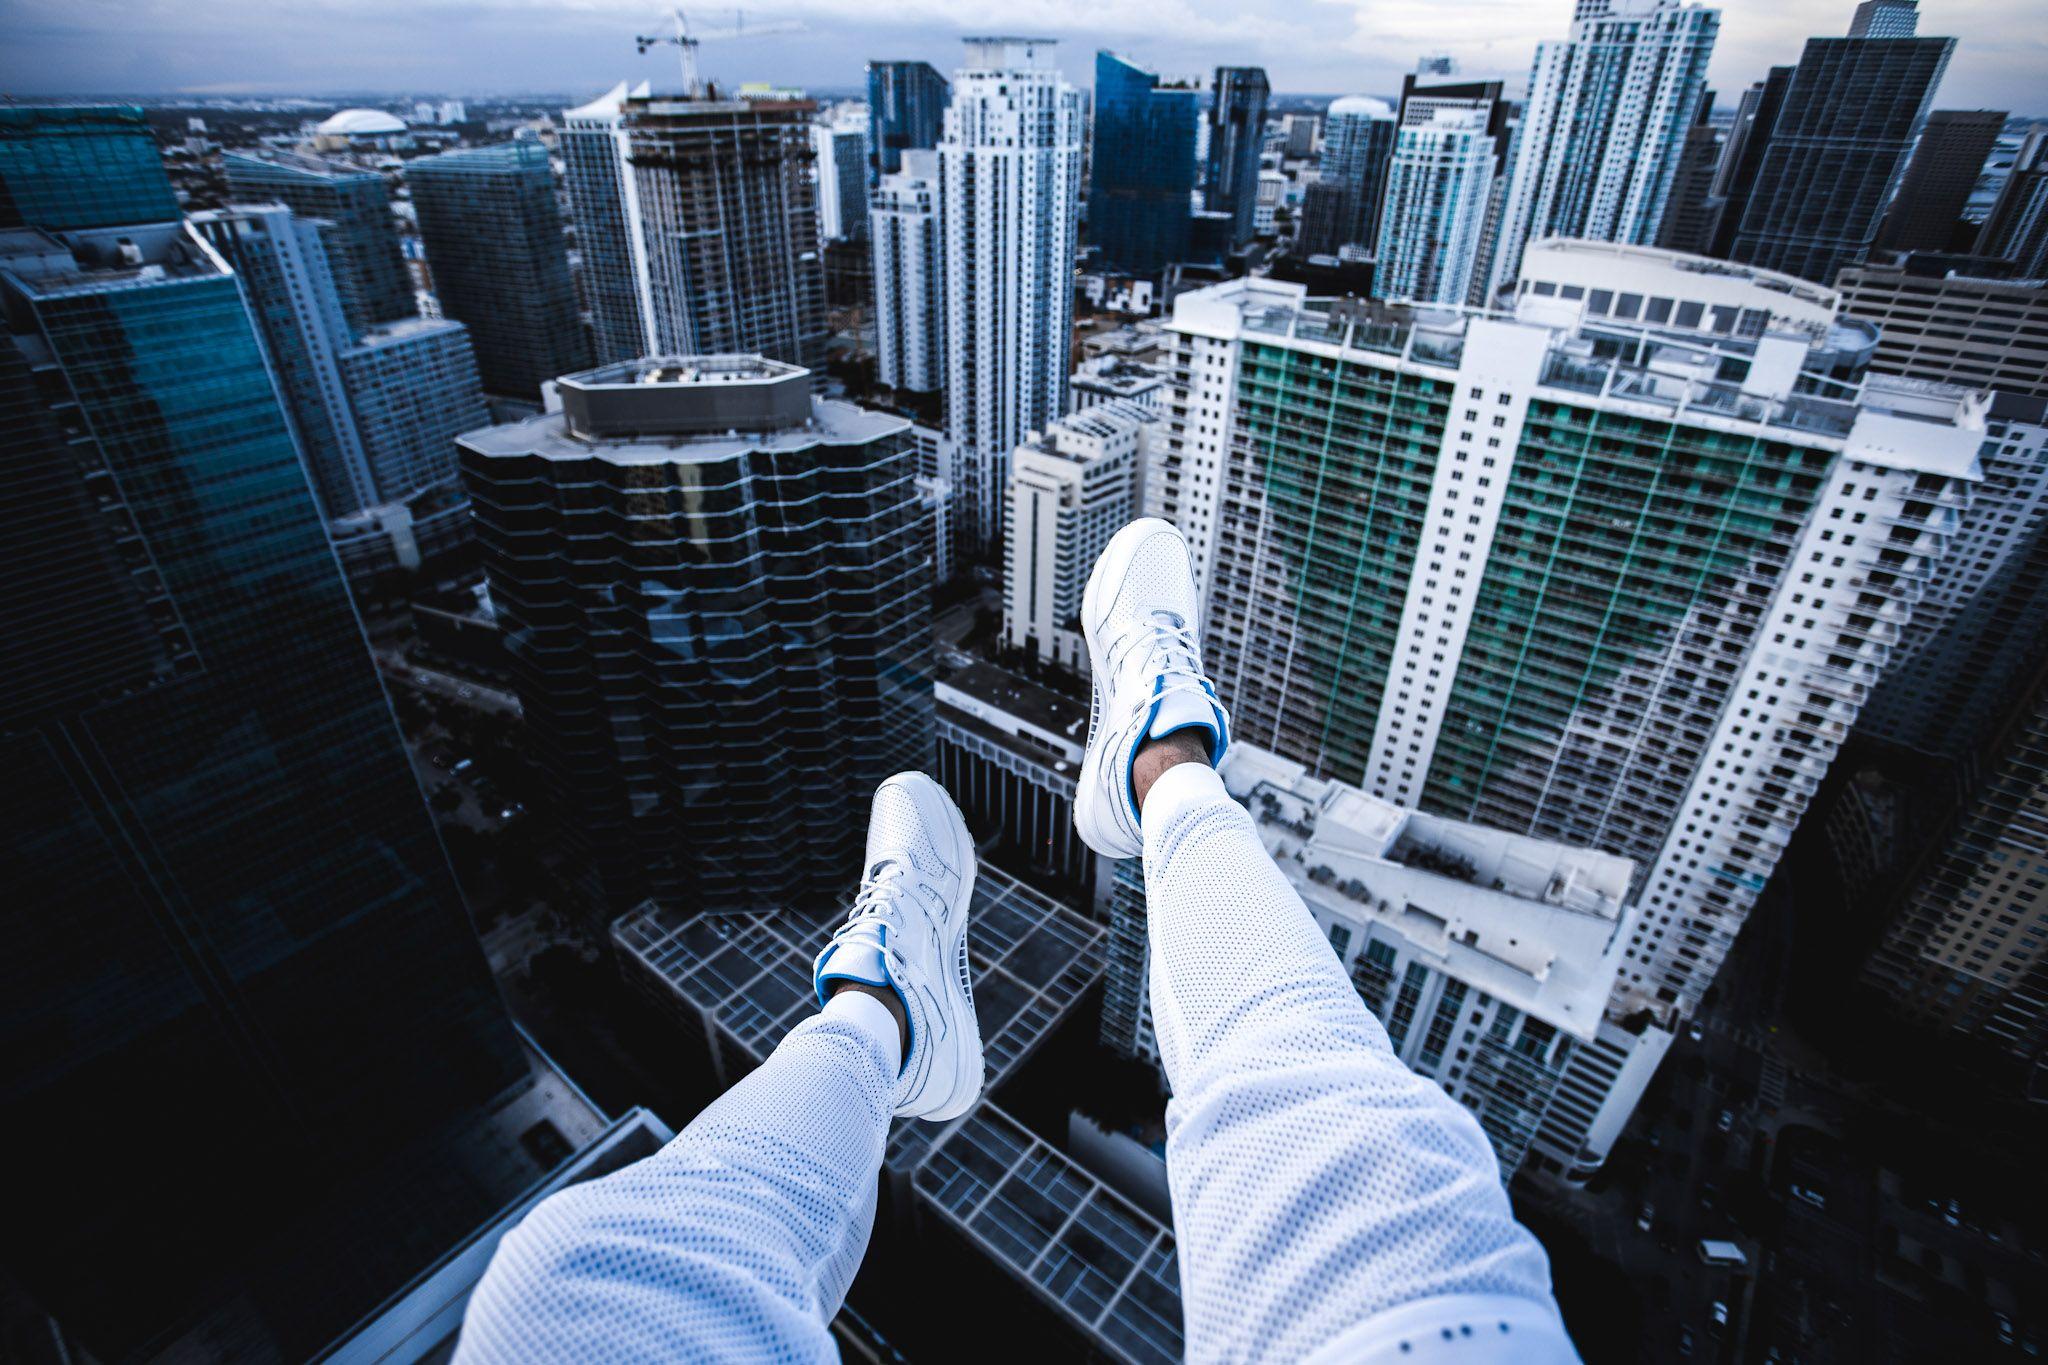 Shoe Gallery x Reebok Ventilator – El Mariel,  #ElMariel #Reebok #ShoeGallery #sneaker #Ventilator, #agpos, #sneaker, #sneakers, #sneakerhead, #solecollector, #sneakerfreaker,  #nicekicks, #kicks, #kotd, #kicks4eva #kicks0l0gy, #kicksonfire, #womft, #walklikeus, #schuhe, #turnschuhe, #yeezy, #nike, #adidas, #puma, #asics, #newbalance #jordan, #airjordan, #kicks